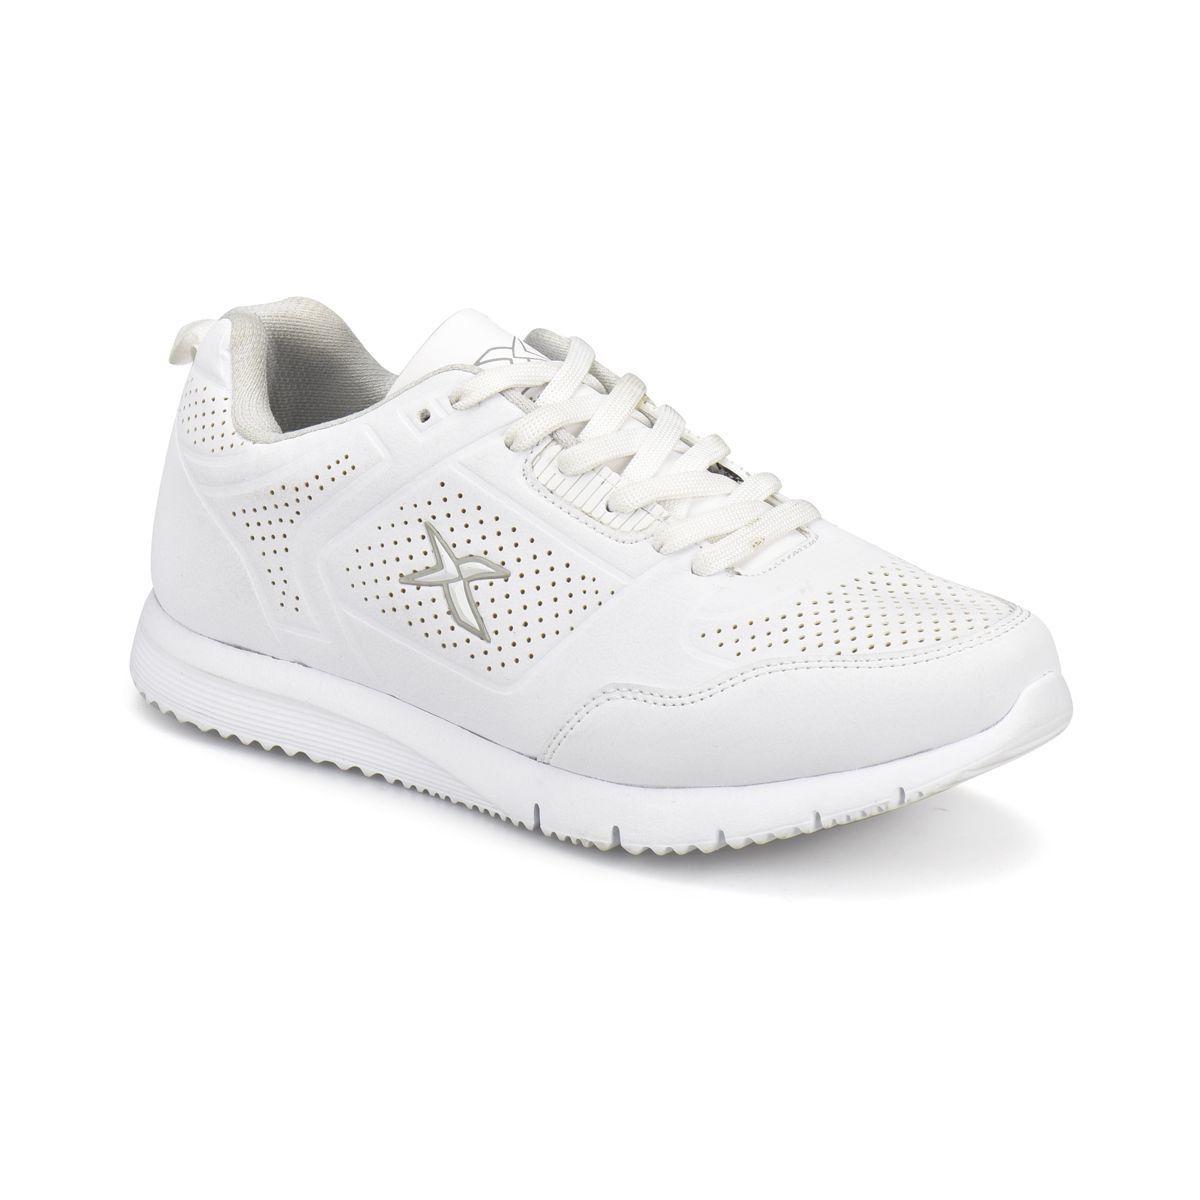 Kinetix Beyaz Kadin Sneaker Ss18 Newseason Summer Spring Shop Shopping Fashion Sneaker Ayakkabilar Kadin